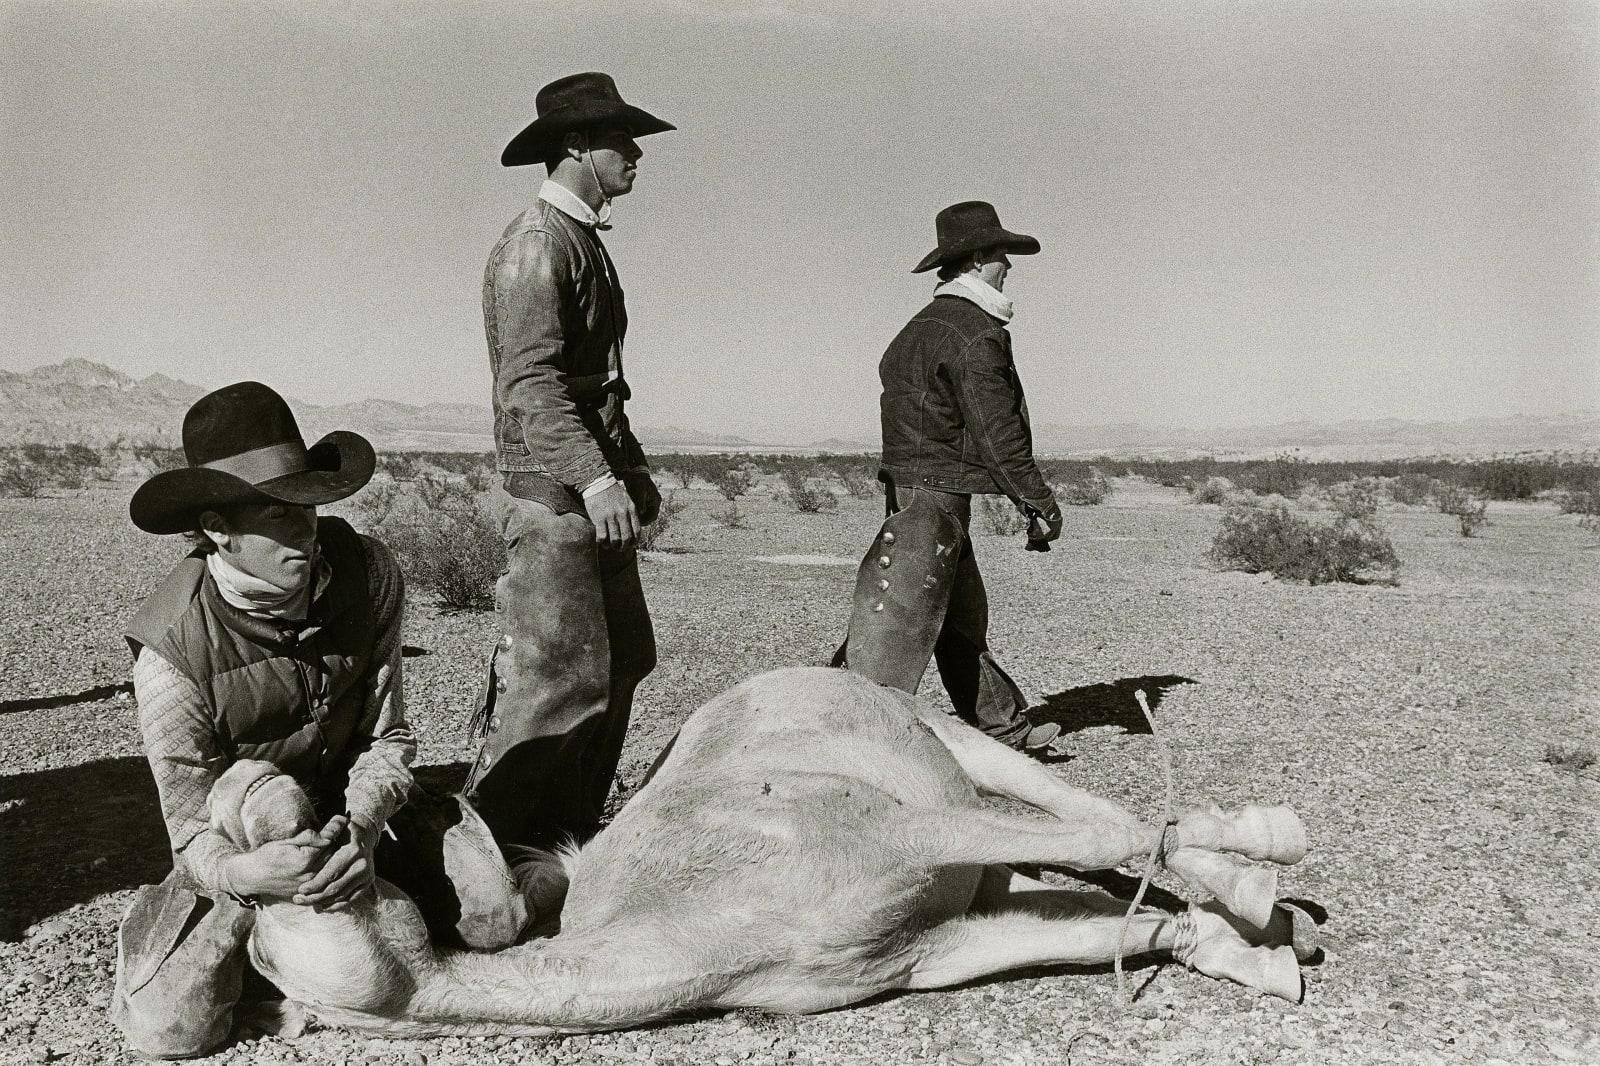 David Hurn - Arizona. Last wild horse round-up. Bullhead City, 1980